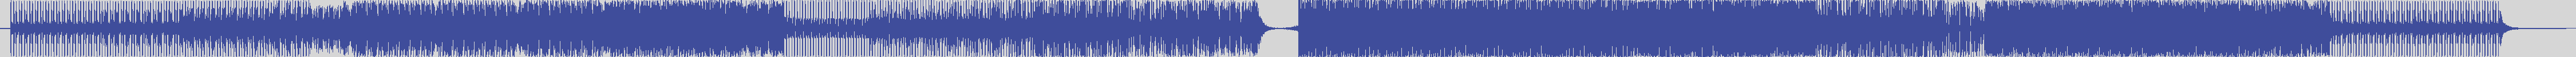 just_digital_records [JS1299] Tony Rollo - Physical Fraction [Original Mix] audio wave form